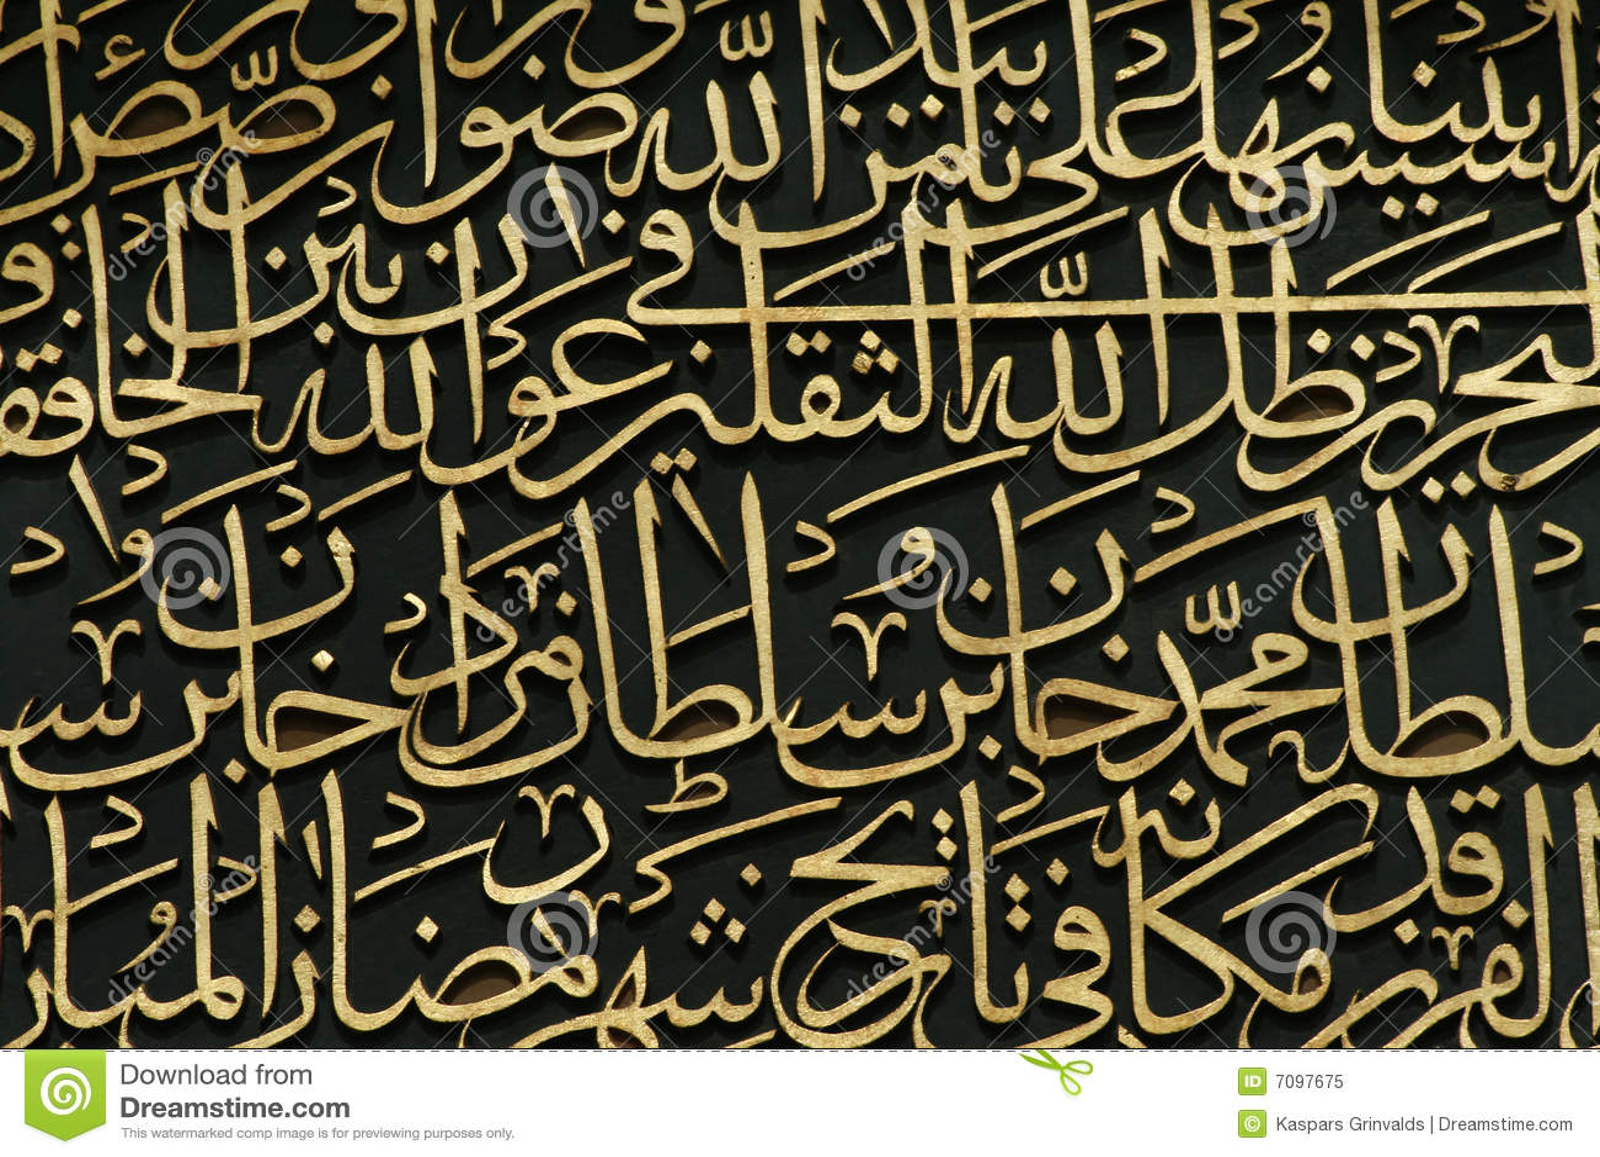 Arabian Calligraphy Background Royalty Free Stock Photo